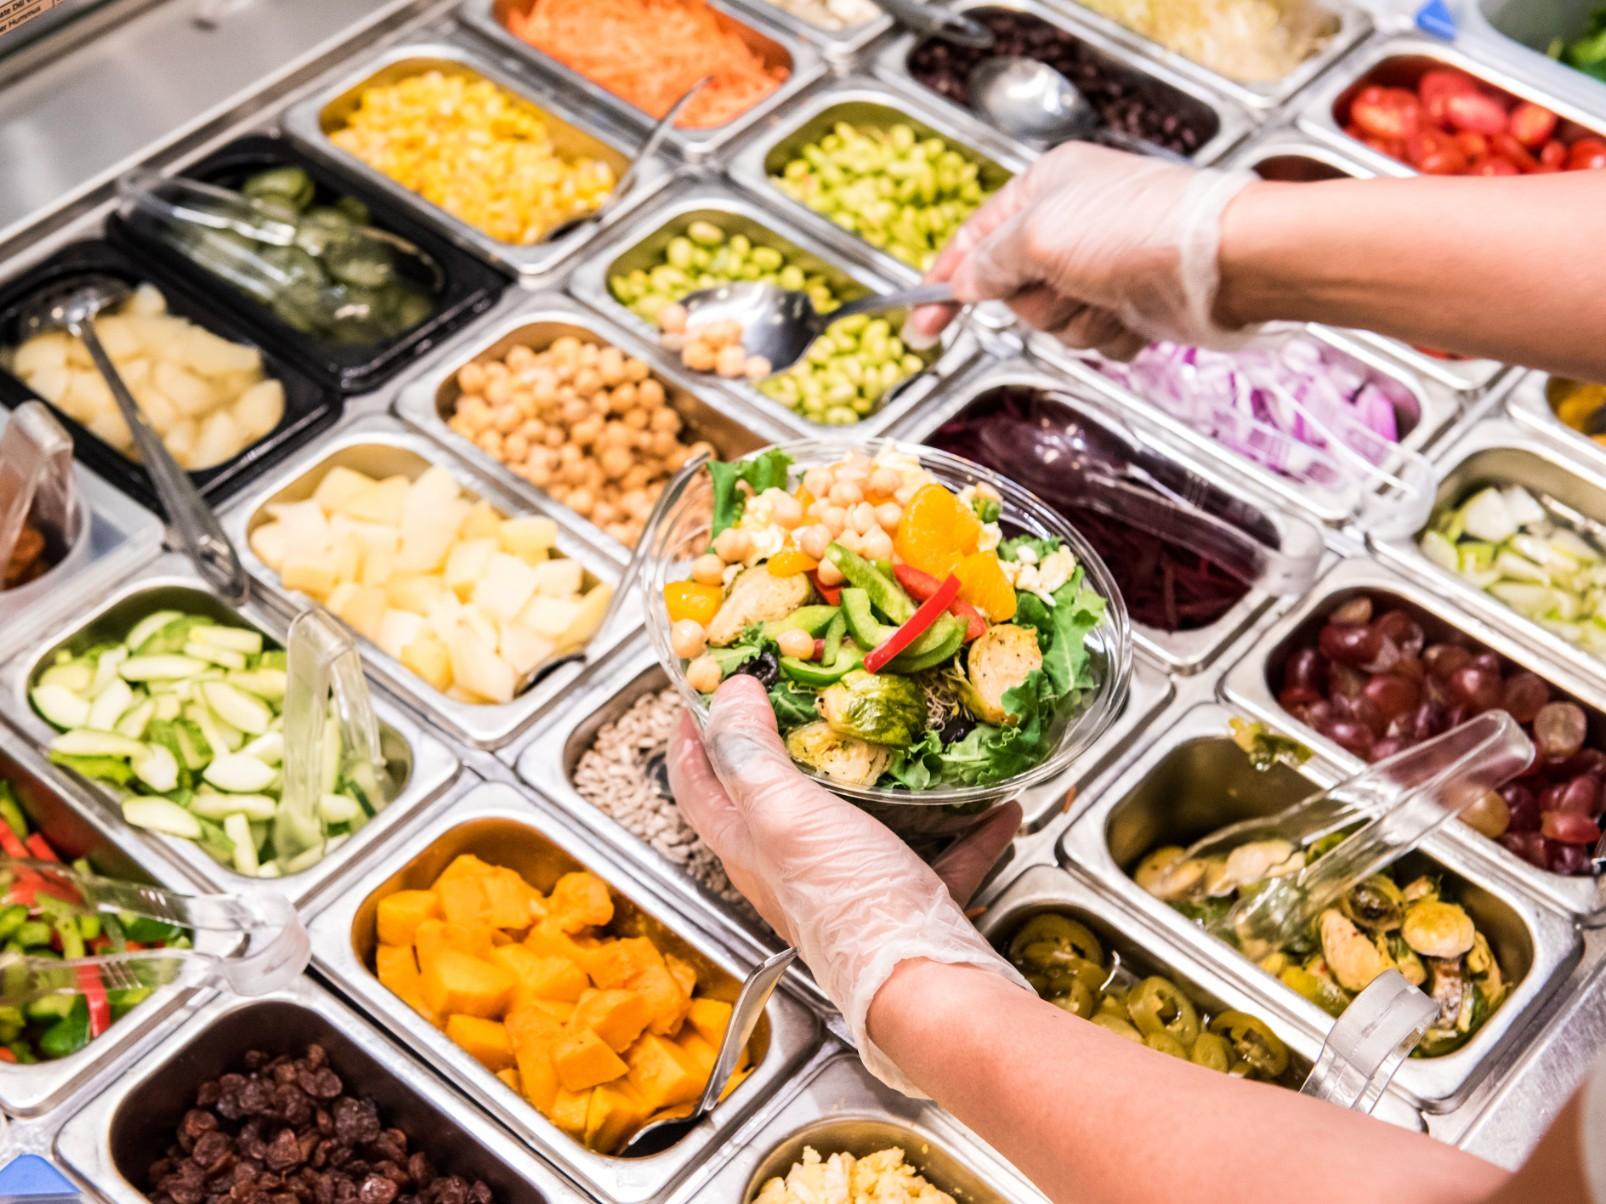 SaladStop! (Changi Business Park) - Dine, Shop, Earn